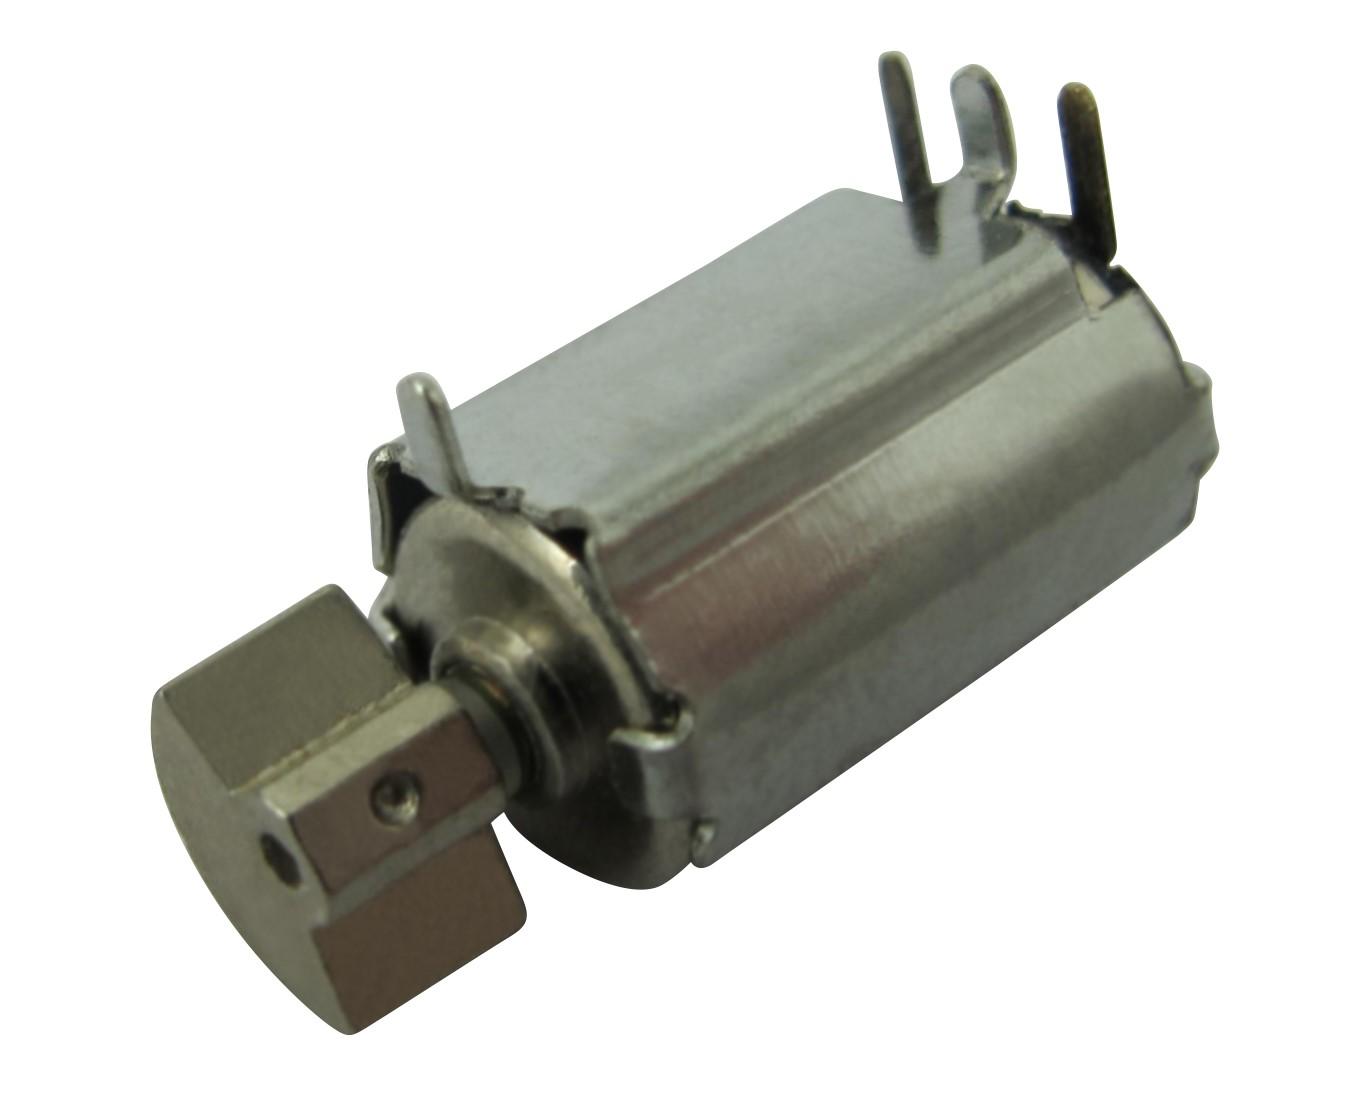 Z6SC0B0170081 Cylindrical Vibrator Motor